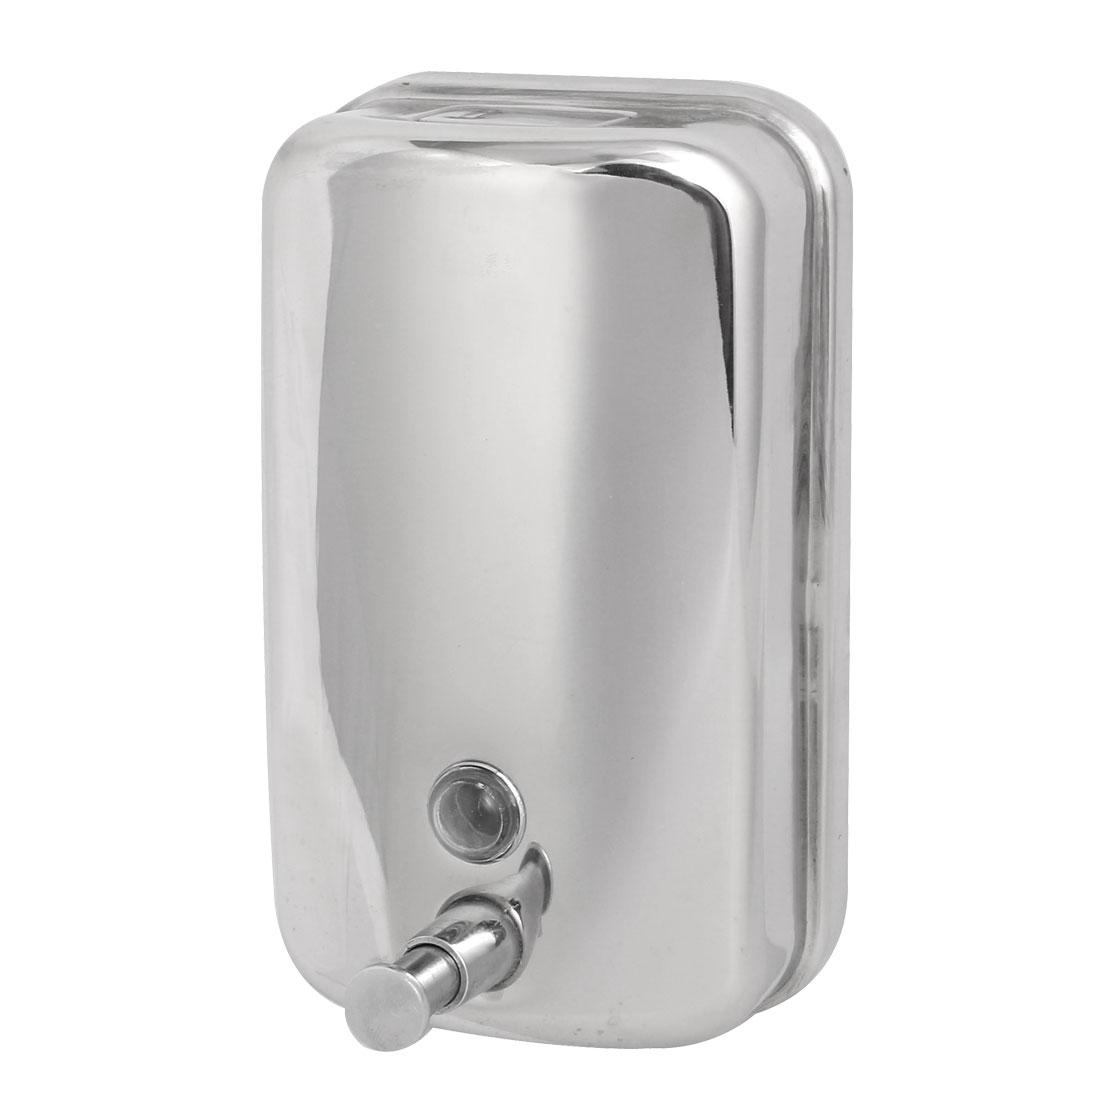 Stainless Steel 1000ML Wall-Mount Bathroom Liquid Soap Dispenser Silver Tone